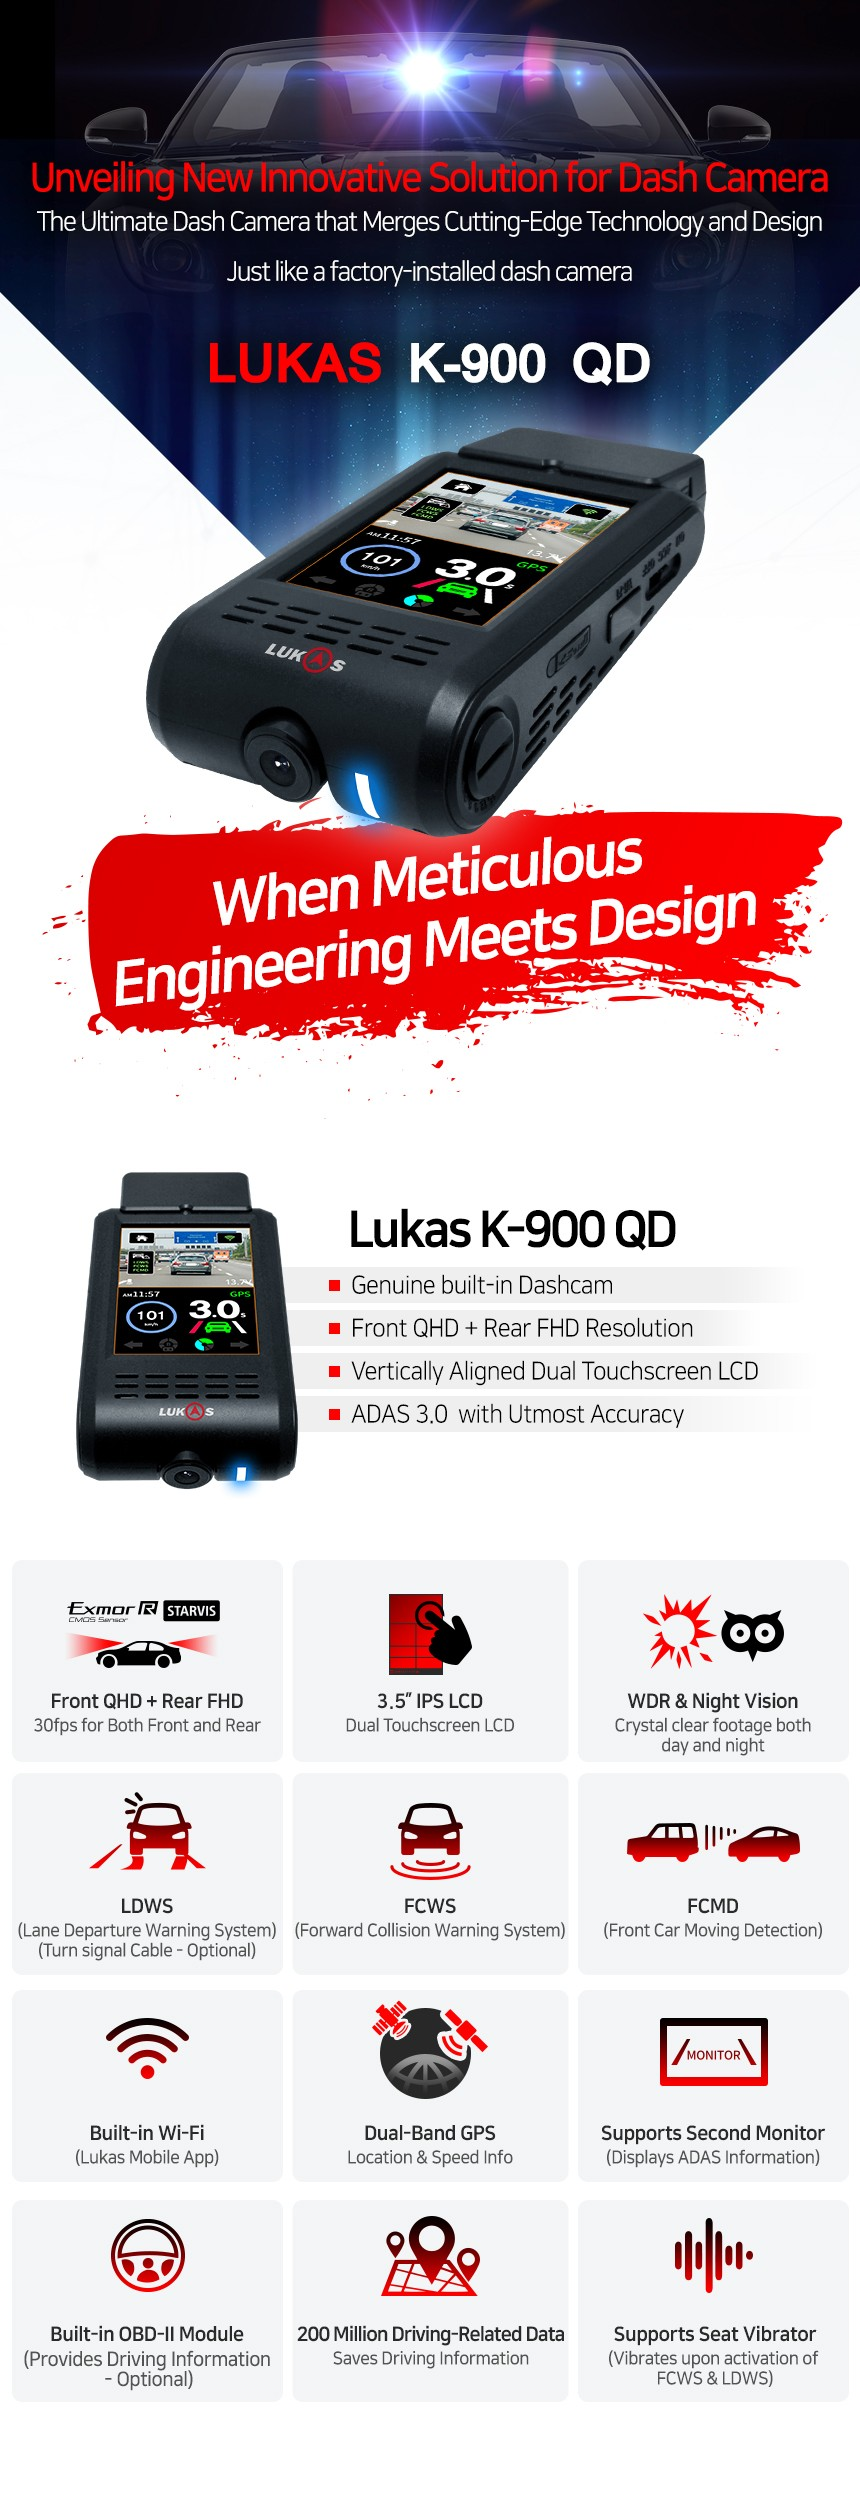 Lukas K-900 QD 2CH Dash Camera